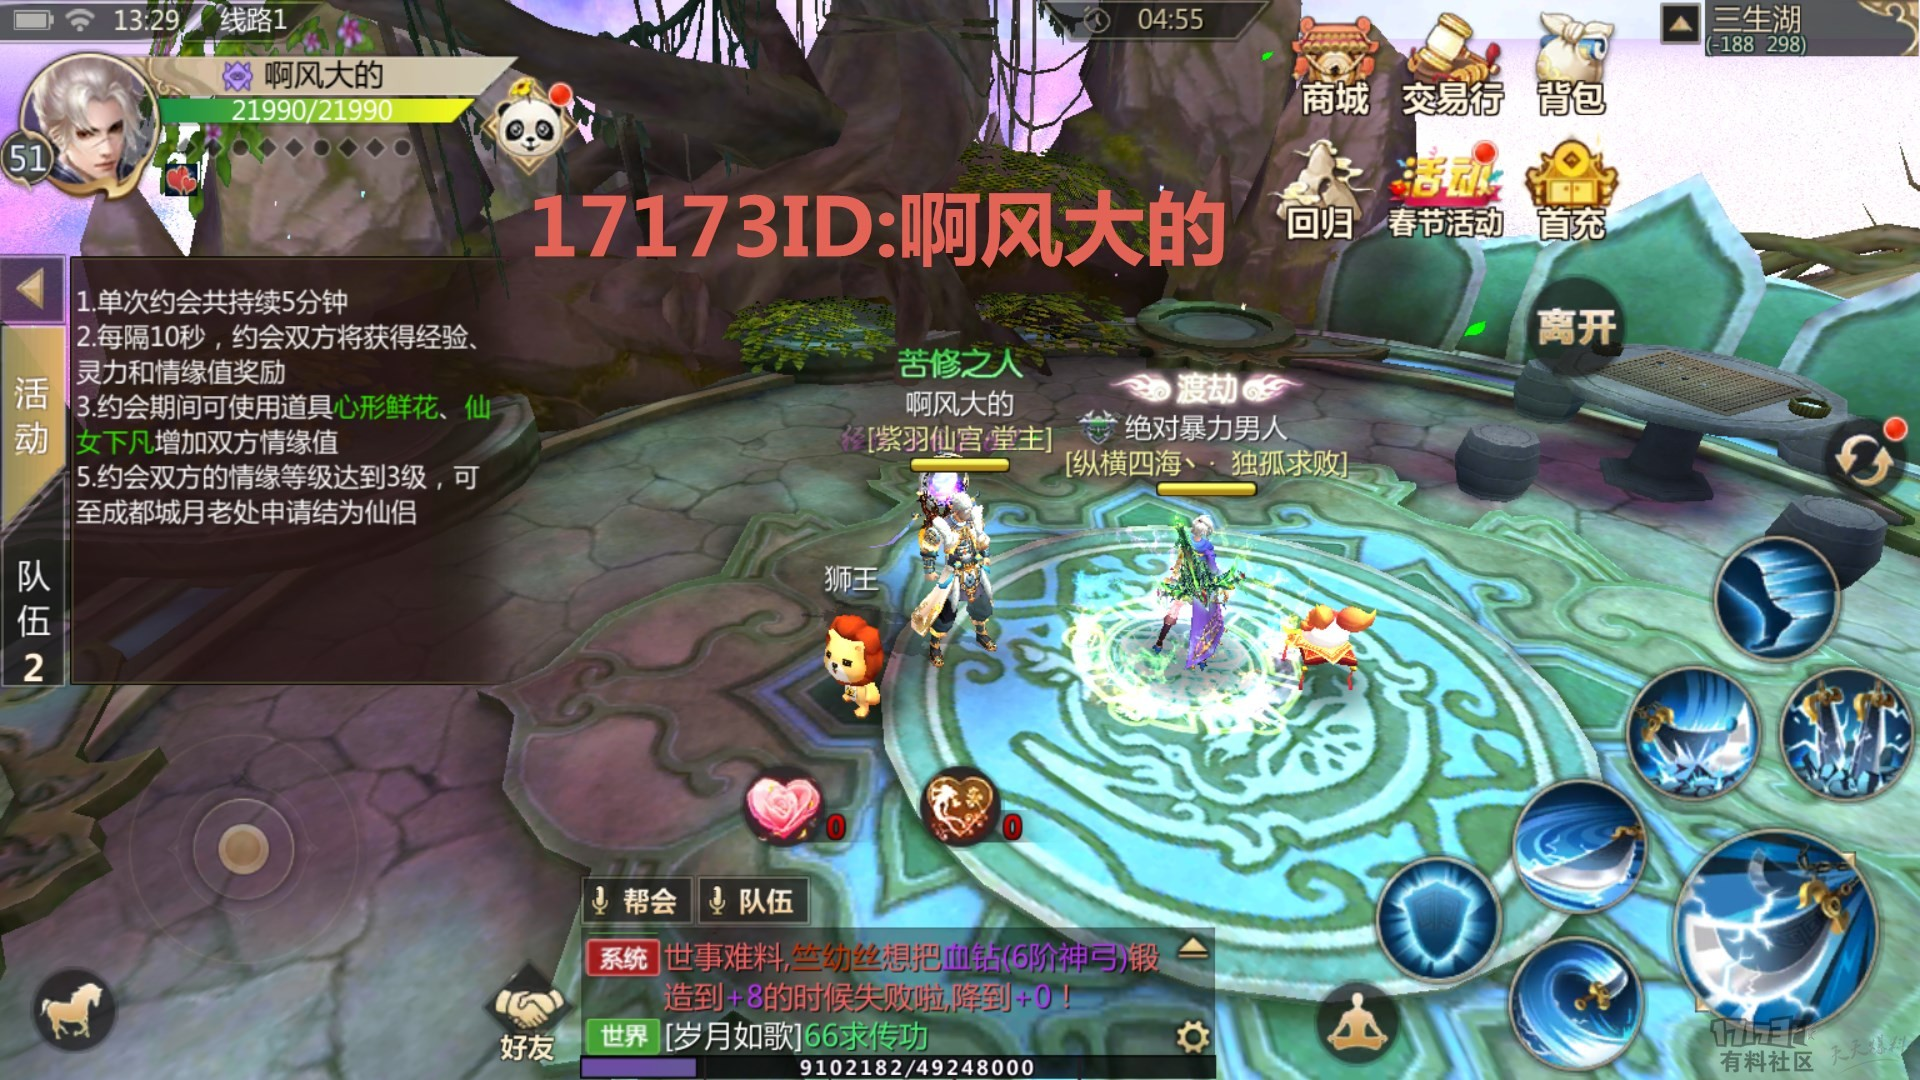 Screenshot_2018-02-05-13-29-07-347_com.ycgame.t11_副本.jpg